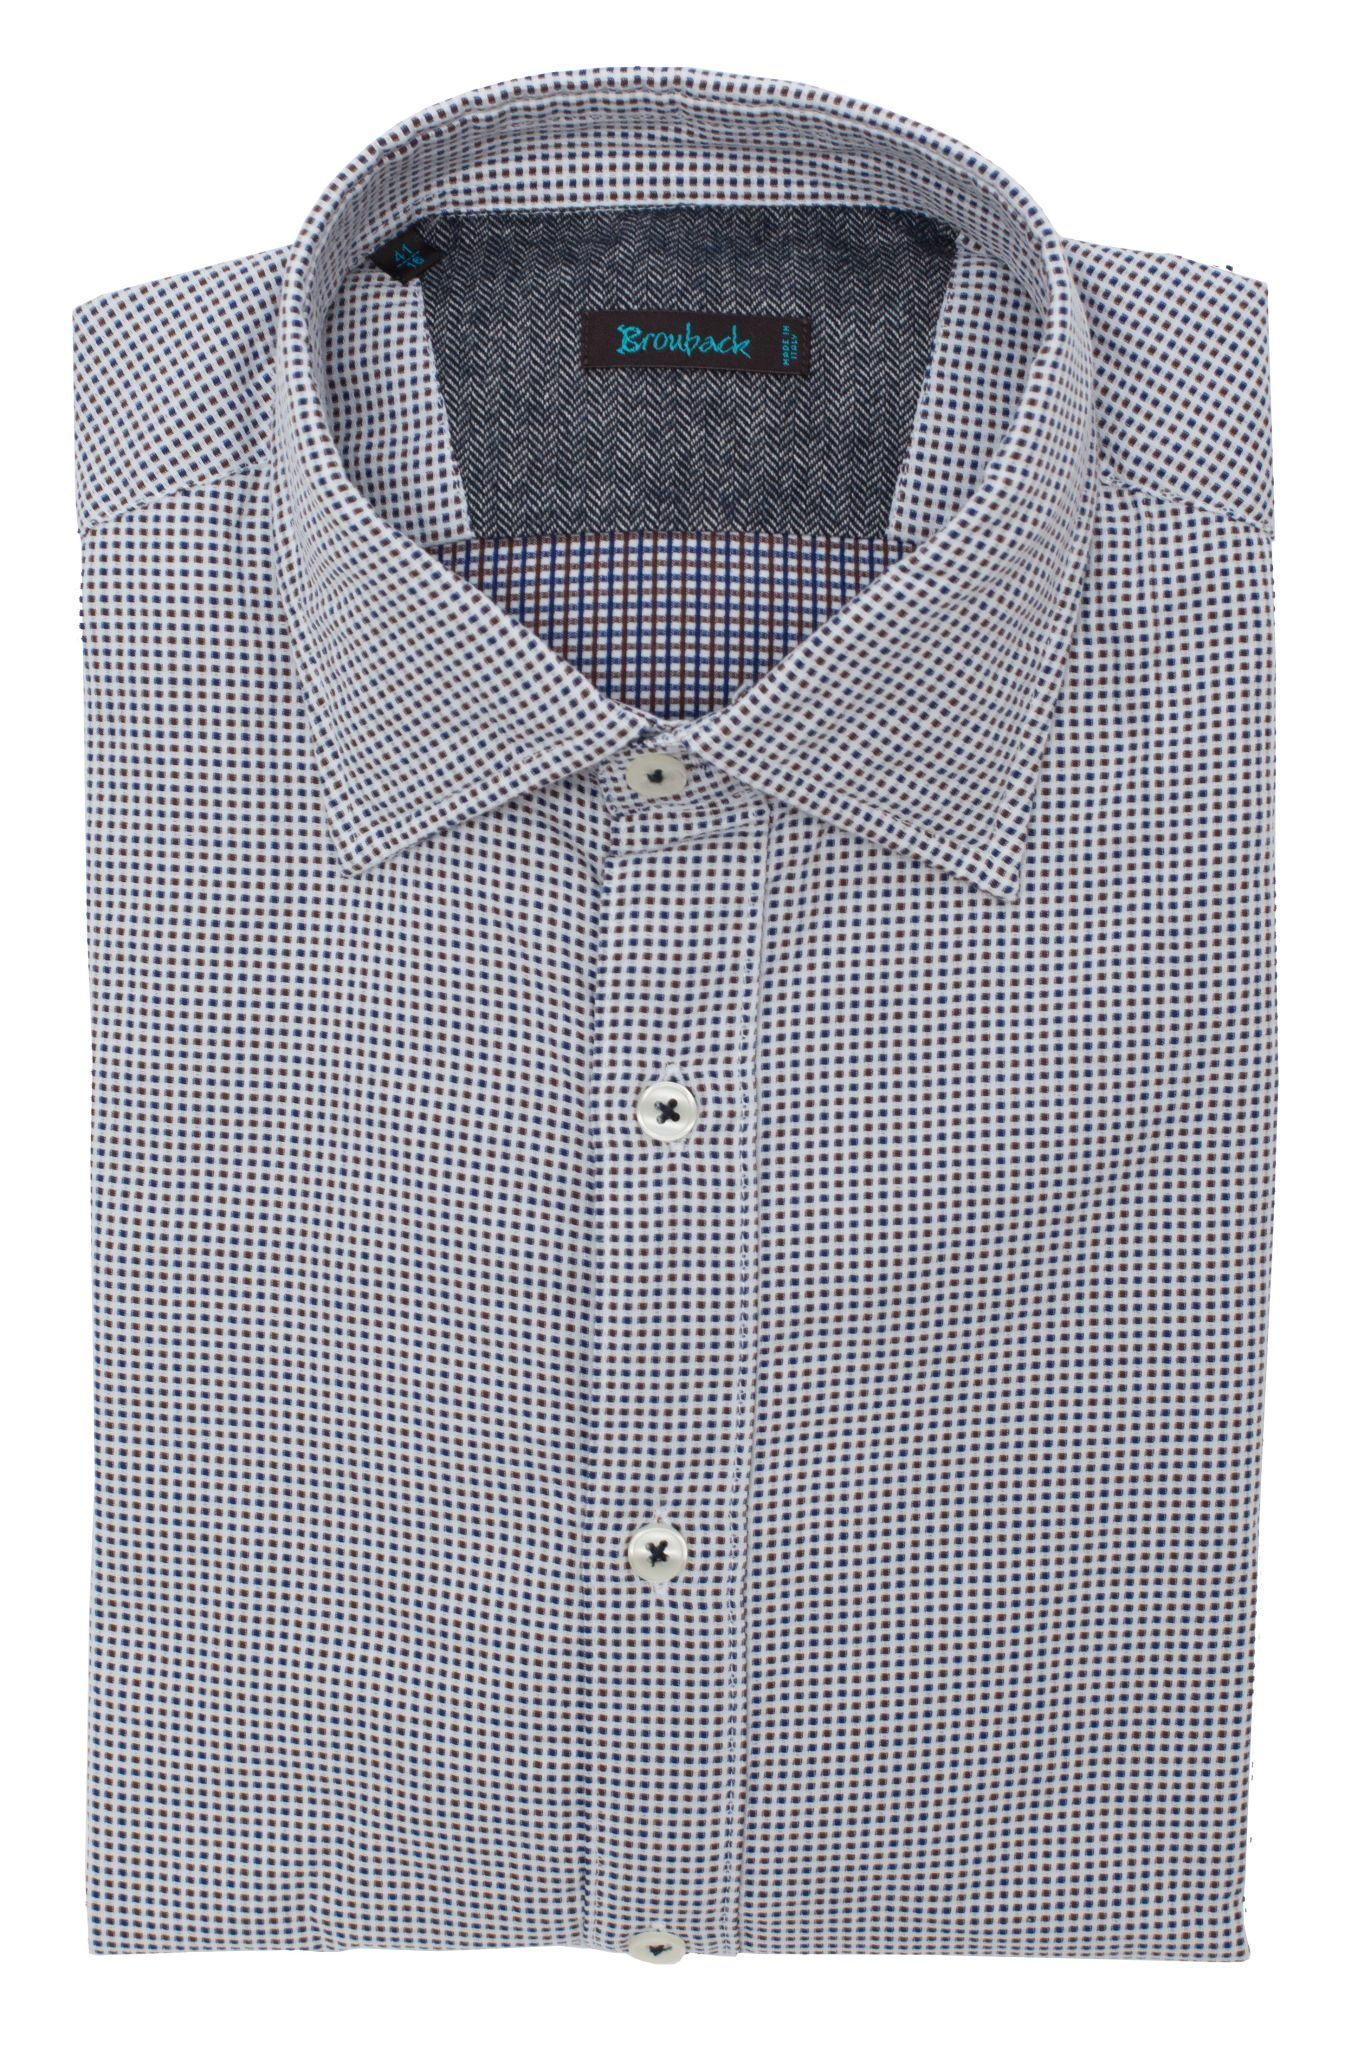 Белая рубашка с мелким бордовым и синим геометрическим узором